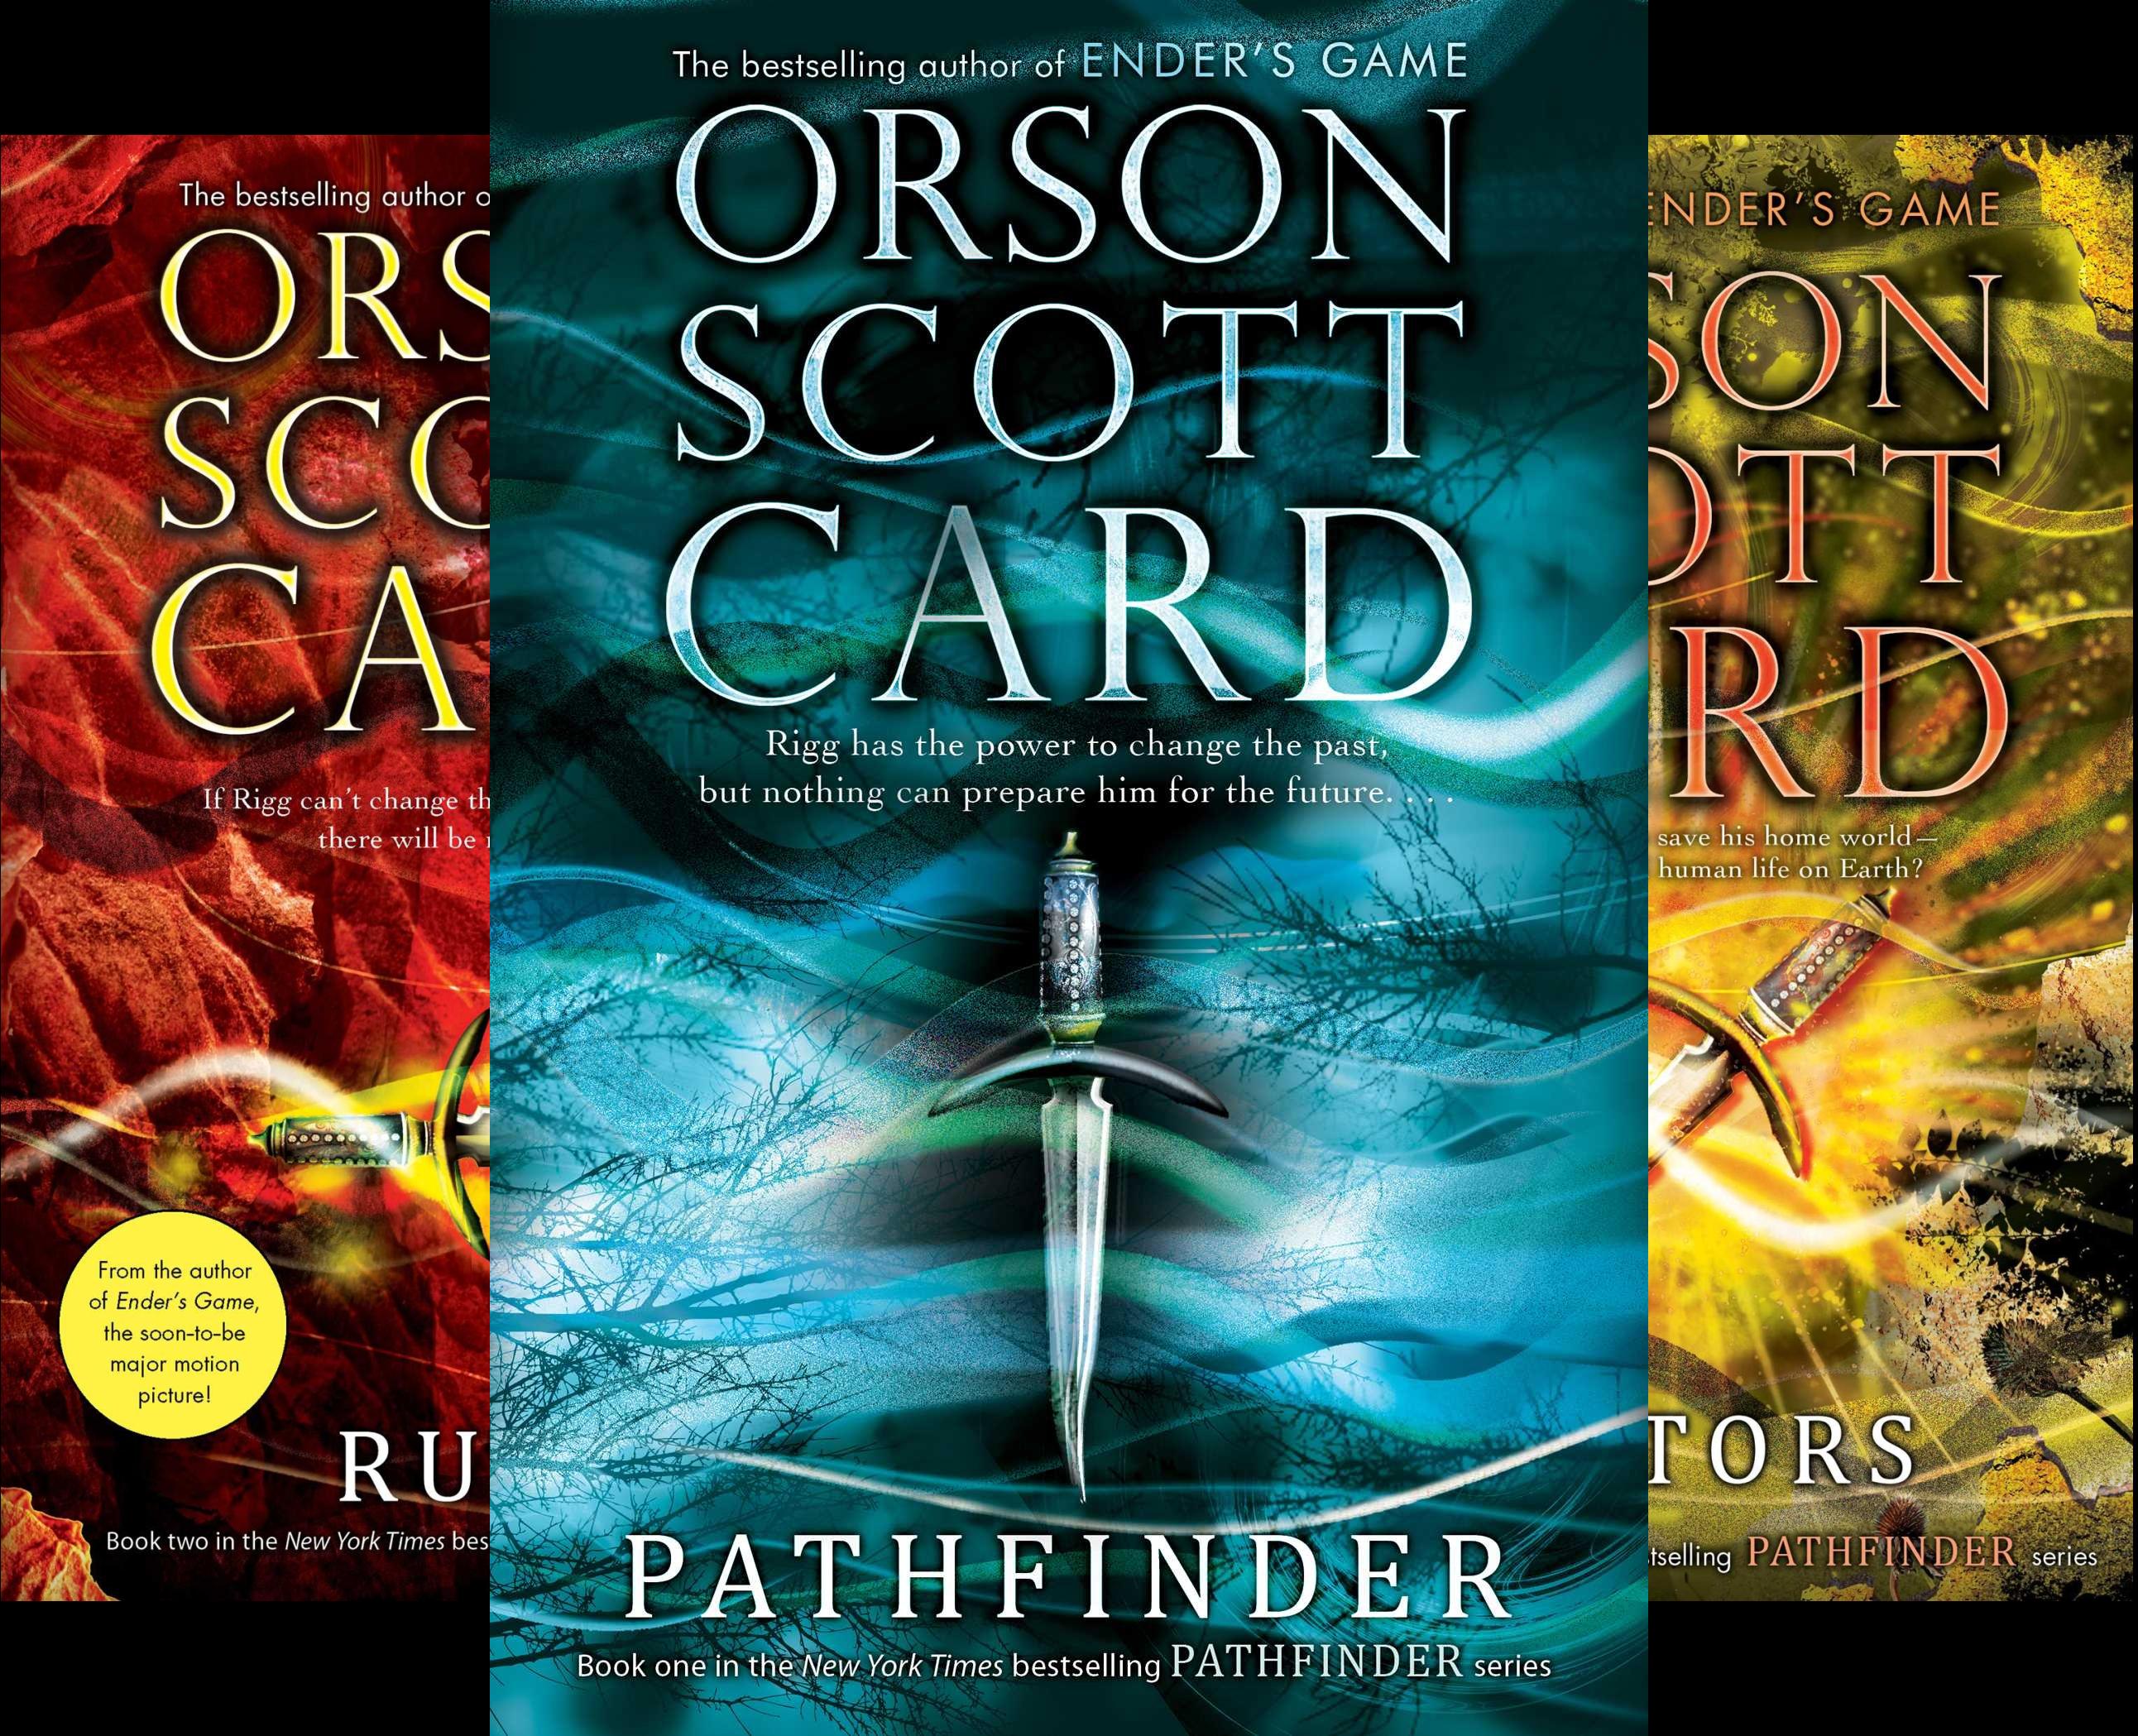 pathfinder-trilogy-3-book-series